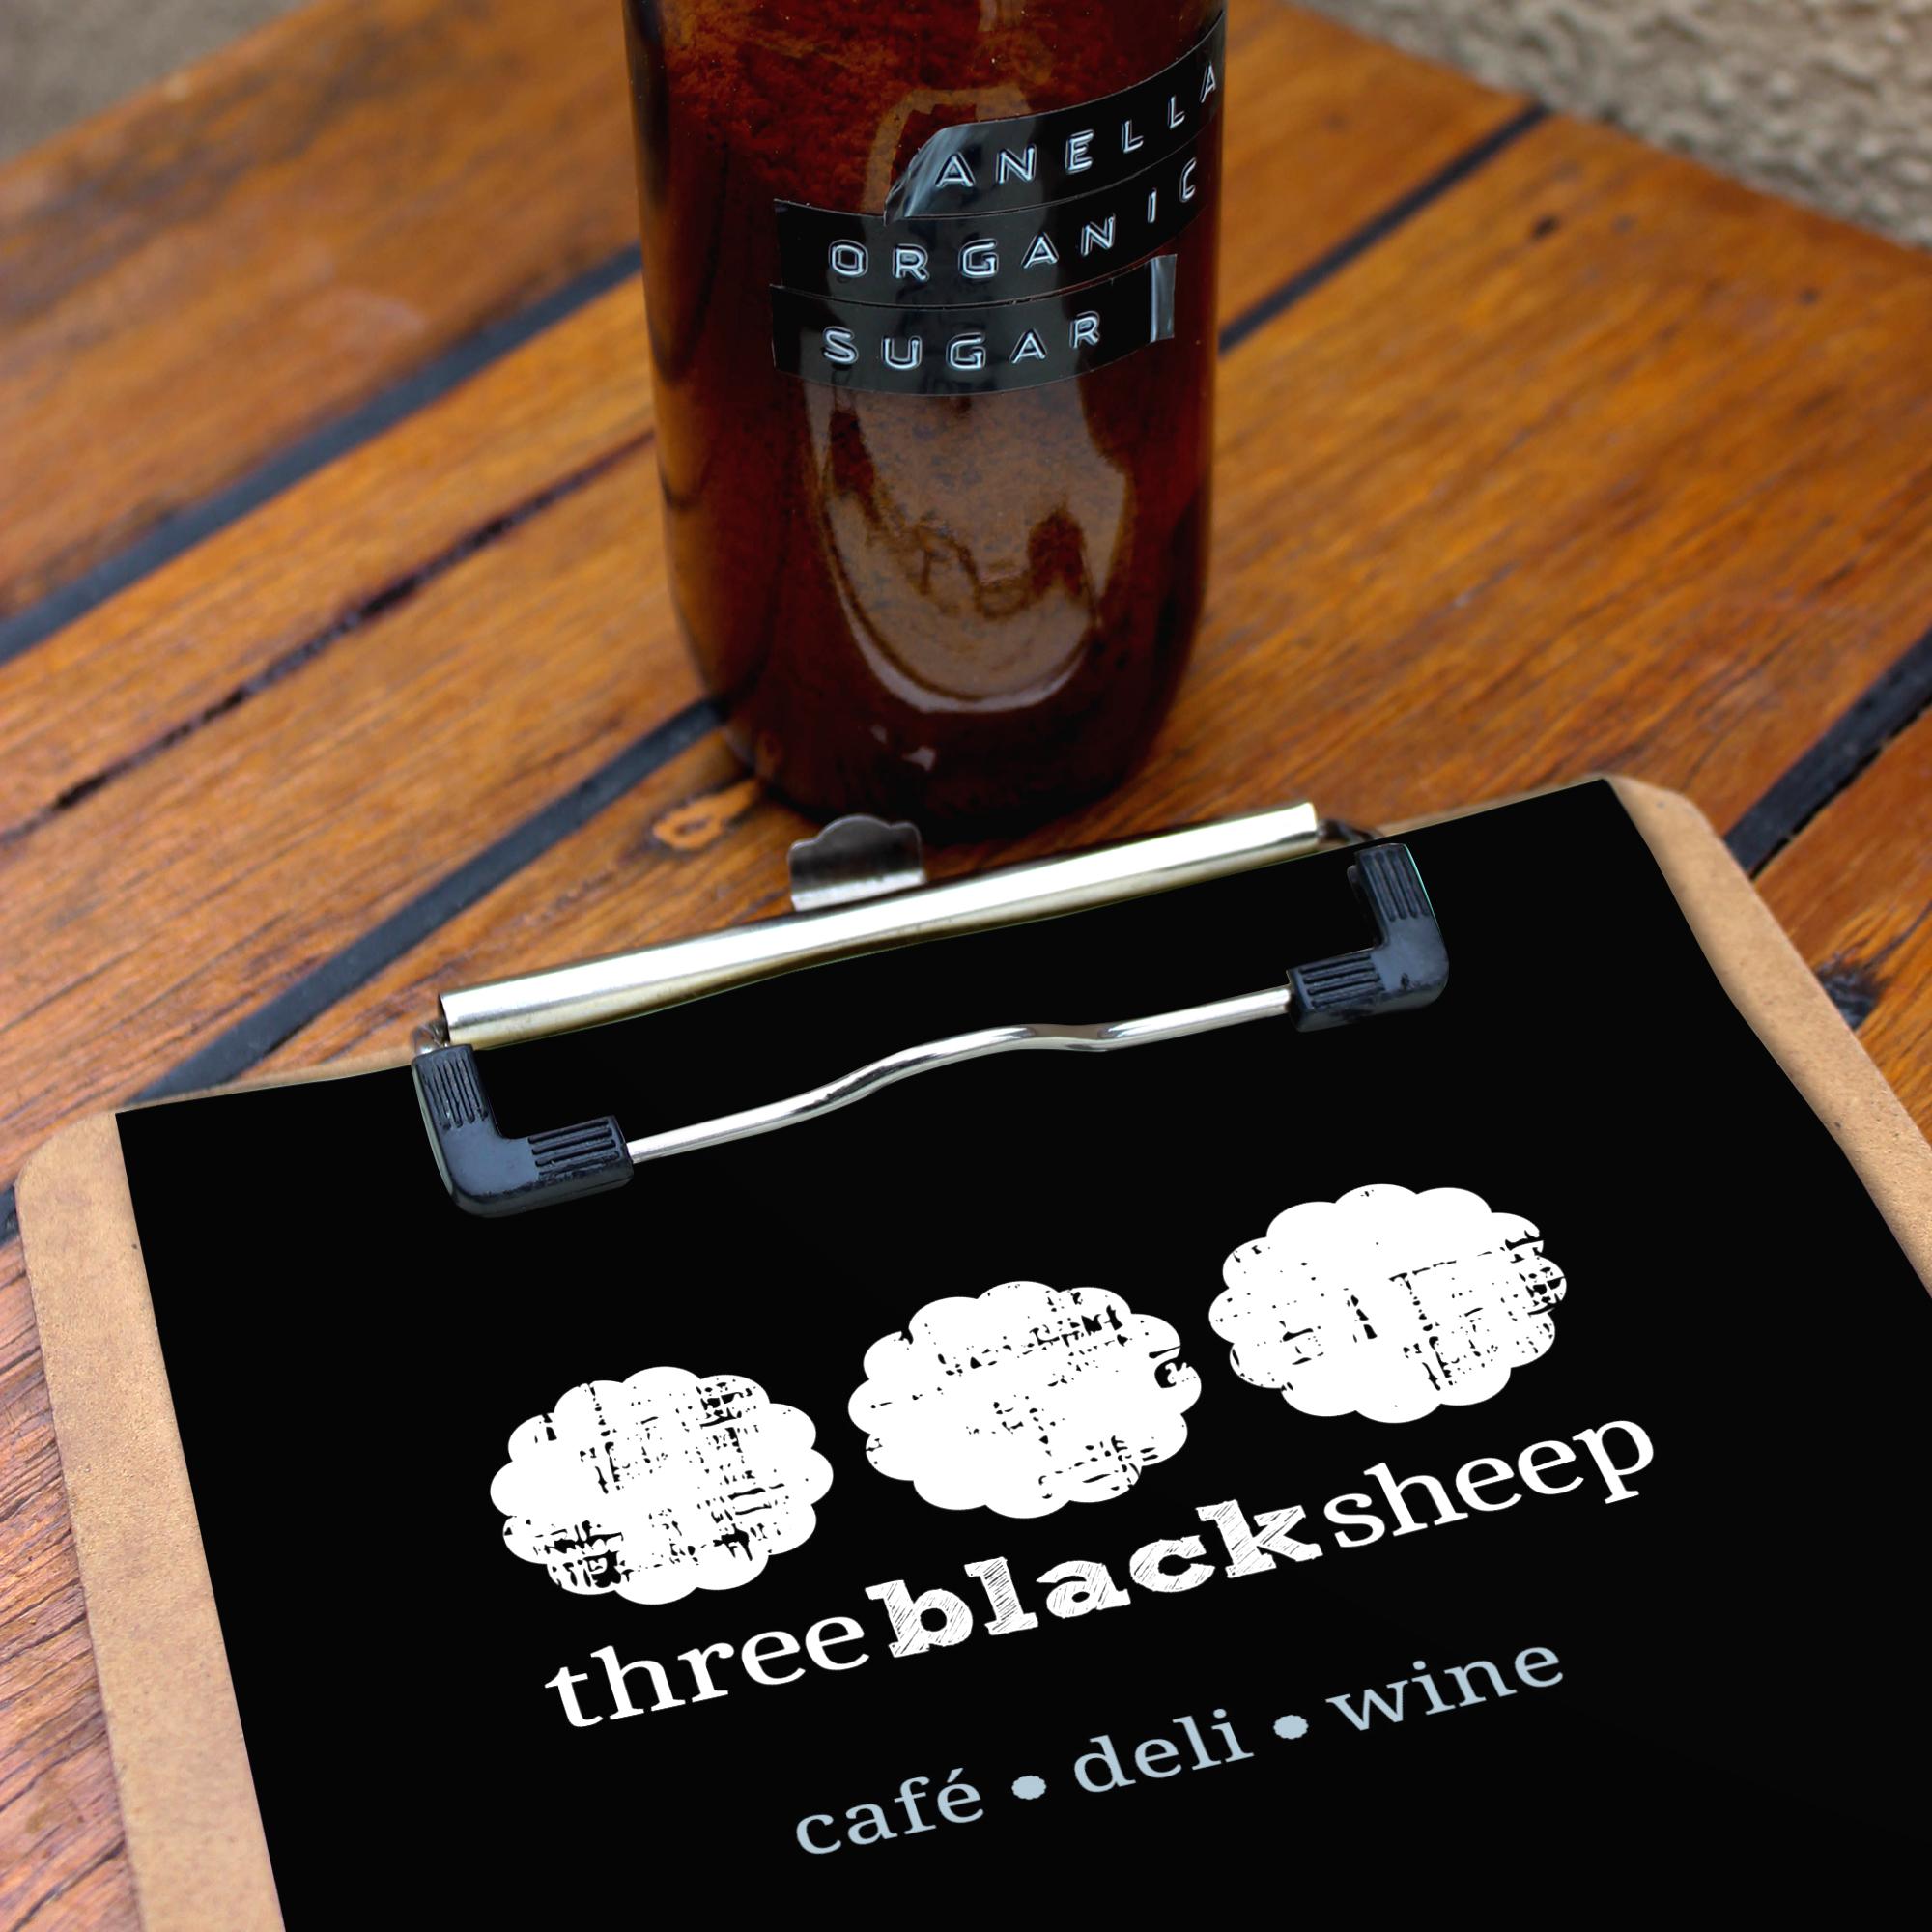 Three Black Sheep menu design